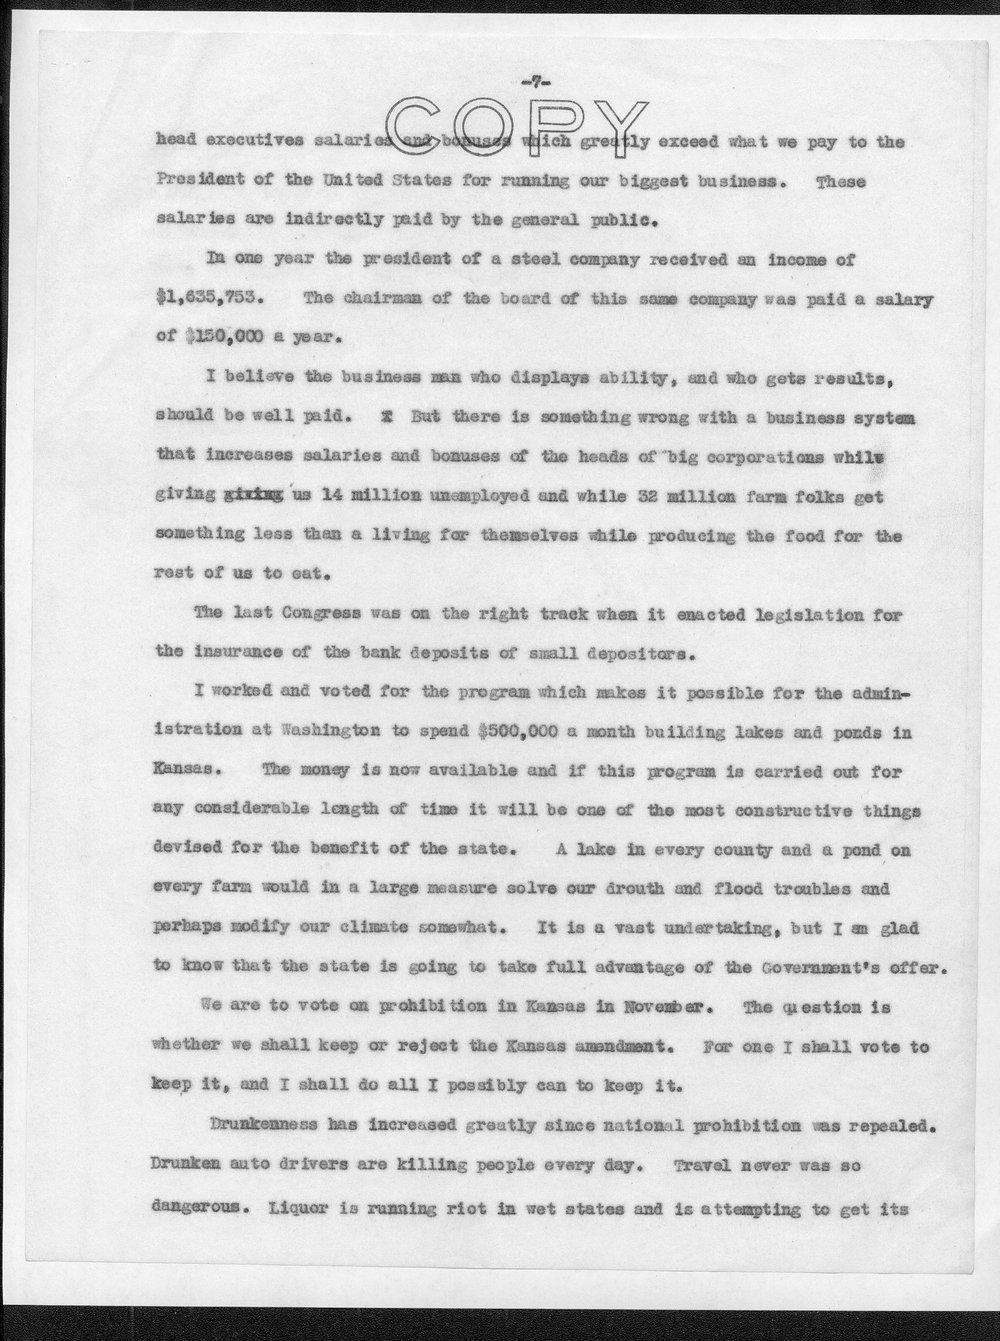 Draft of Senator Arthur Capper's New Deal speech - 7